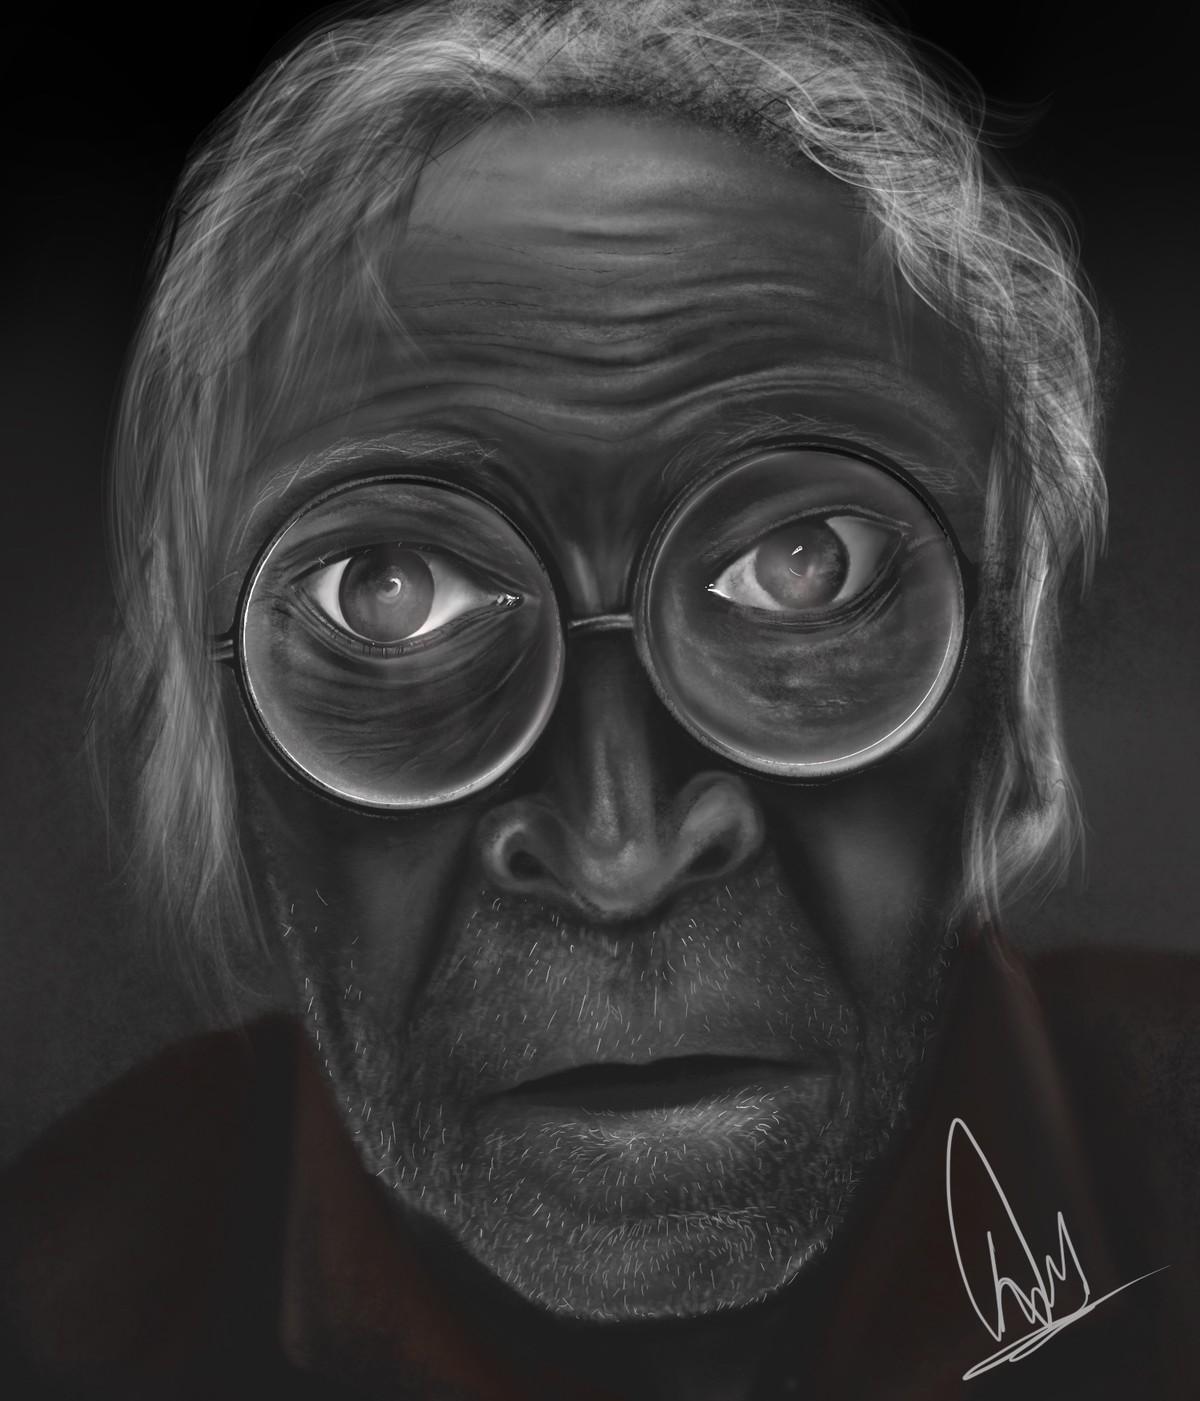 Angst by Deepankar, Expressionism Digital Art, Digital Print on Enhanced Matt, Gray color